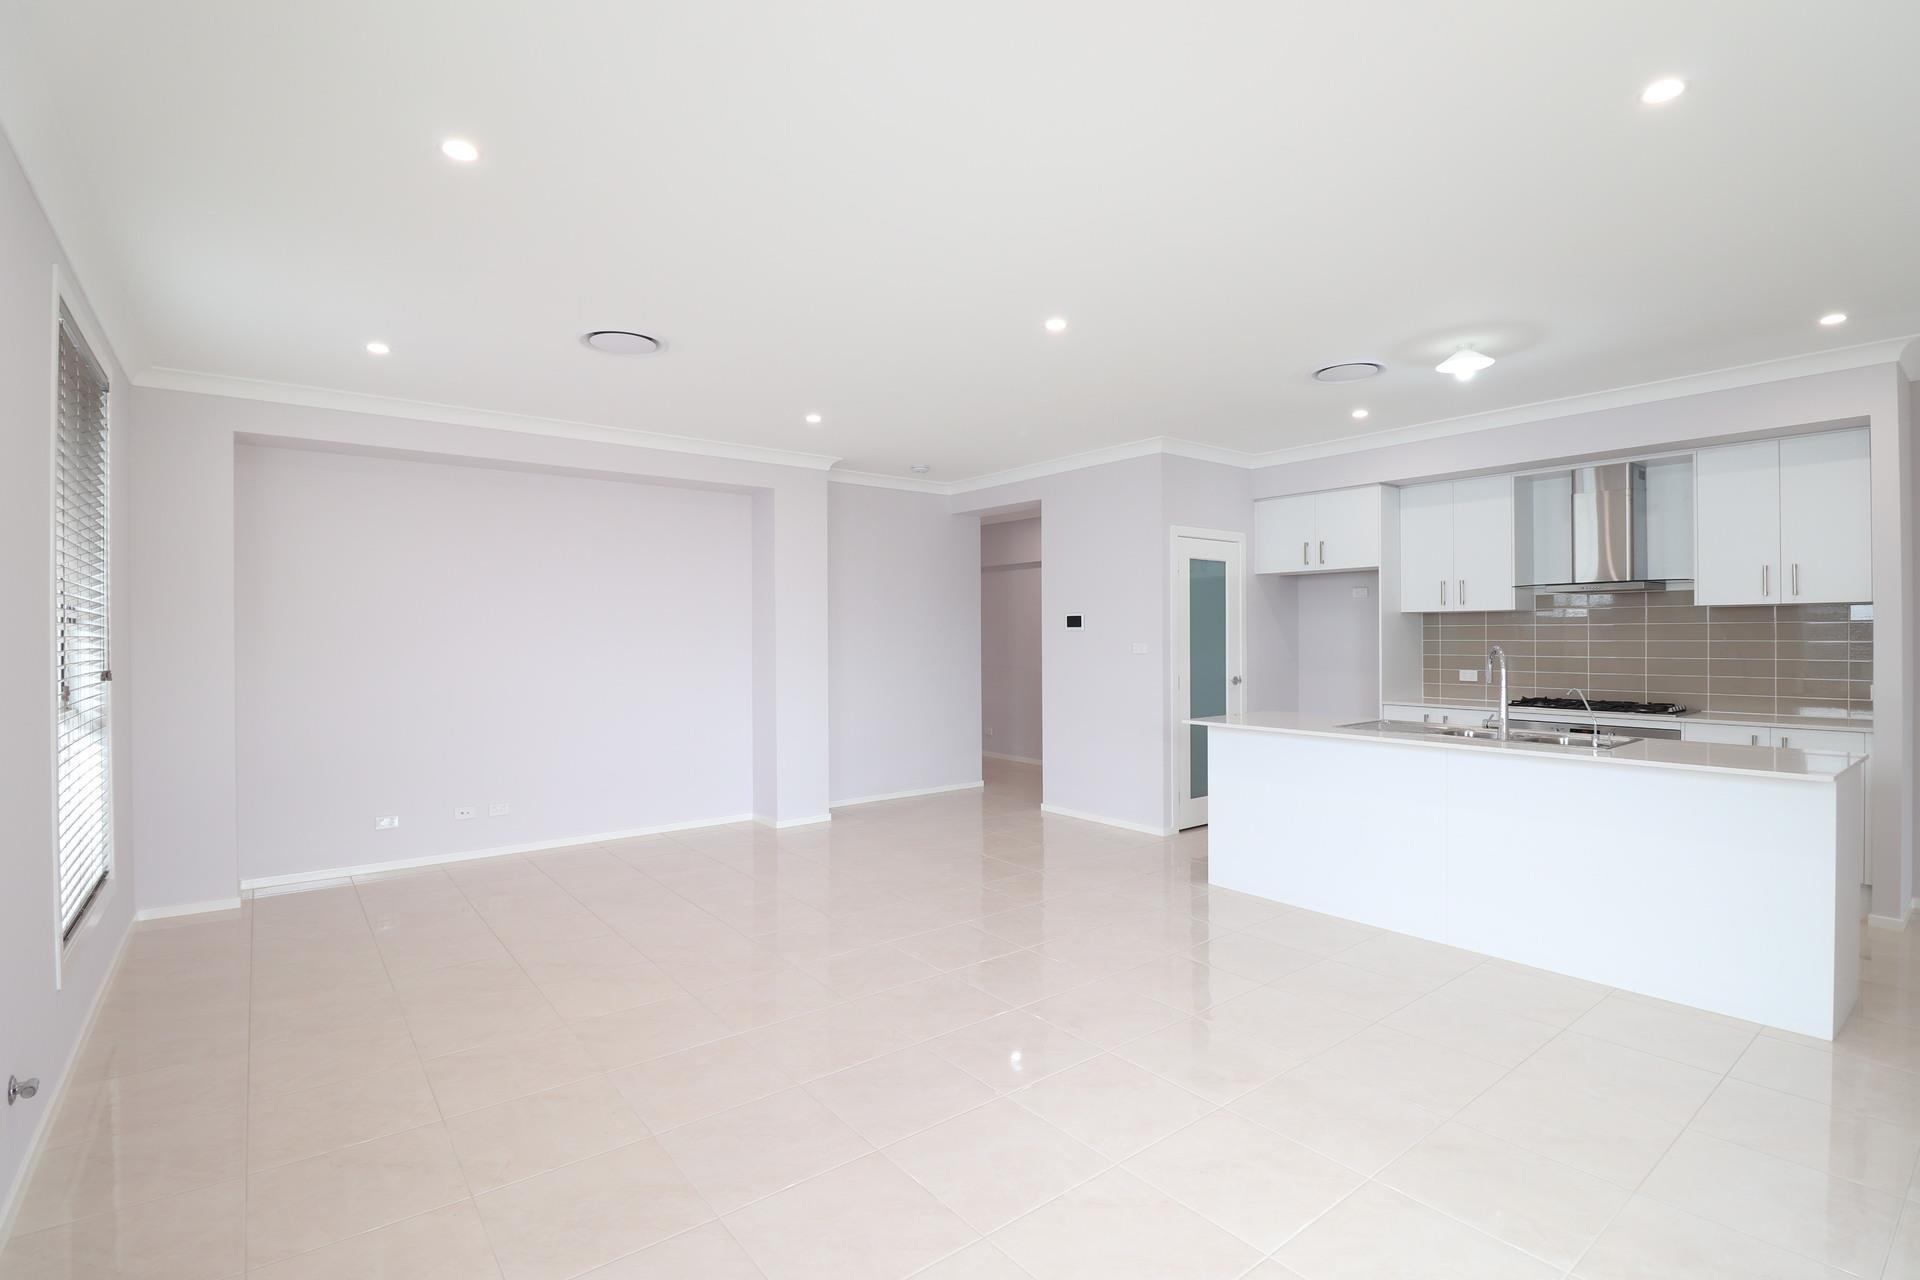 9 Rowan St, Oran Park, NSW 2570